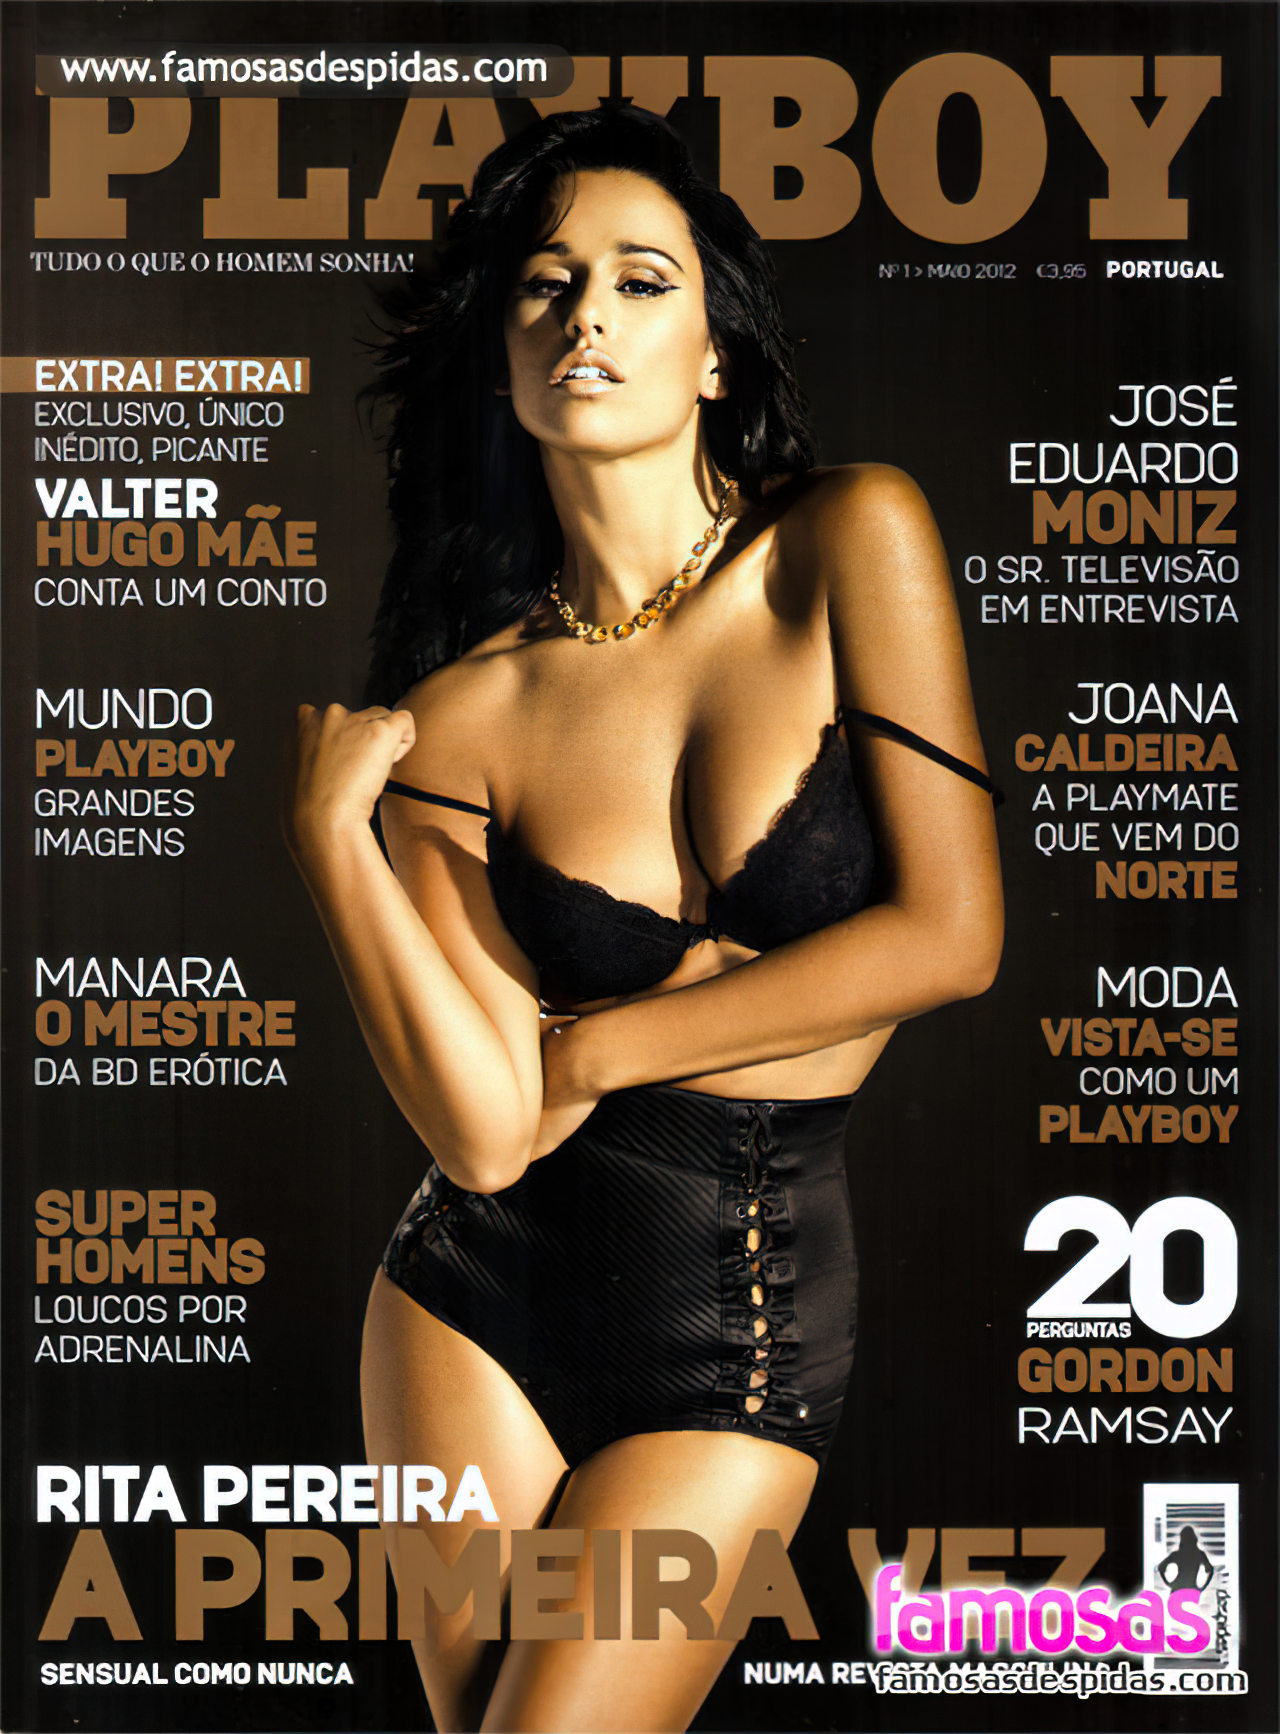 Rita Pereira na Playboy (1)